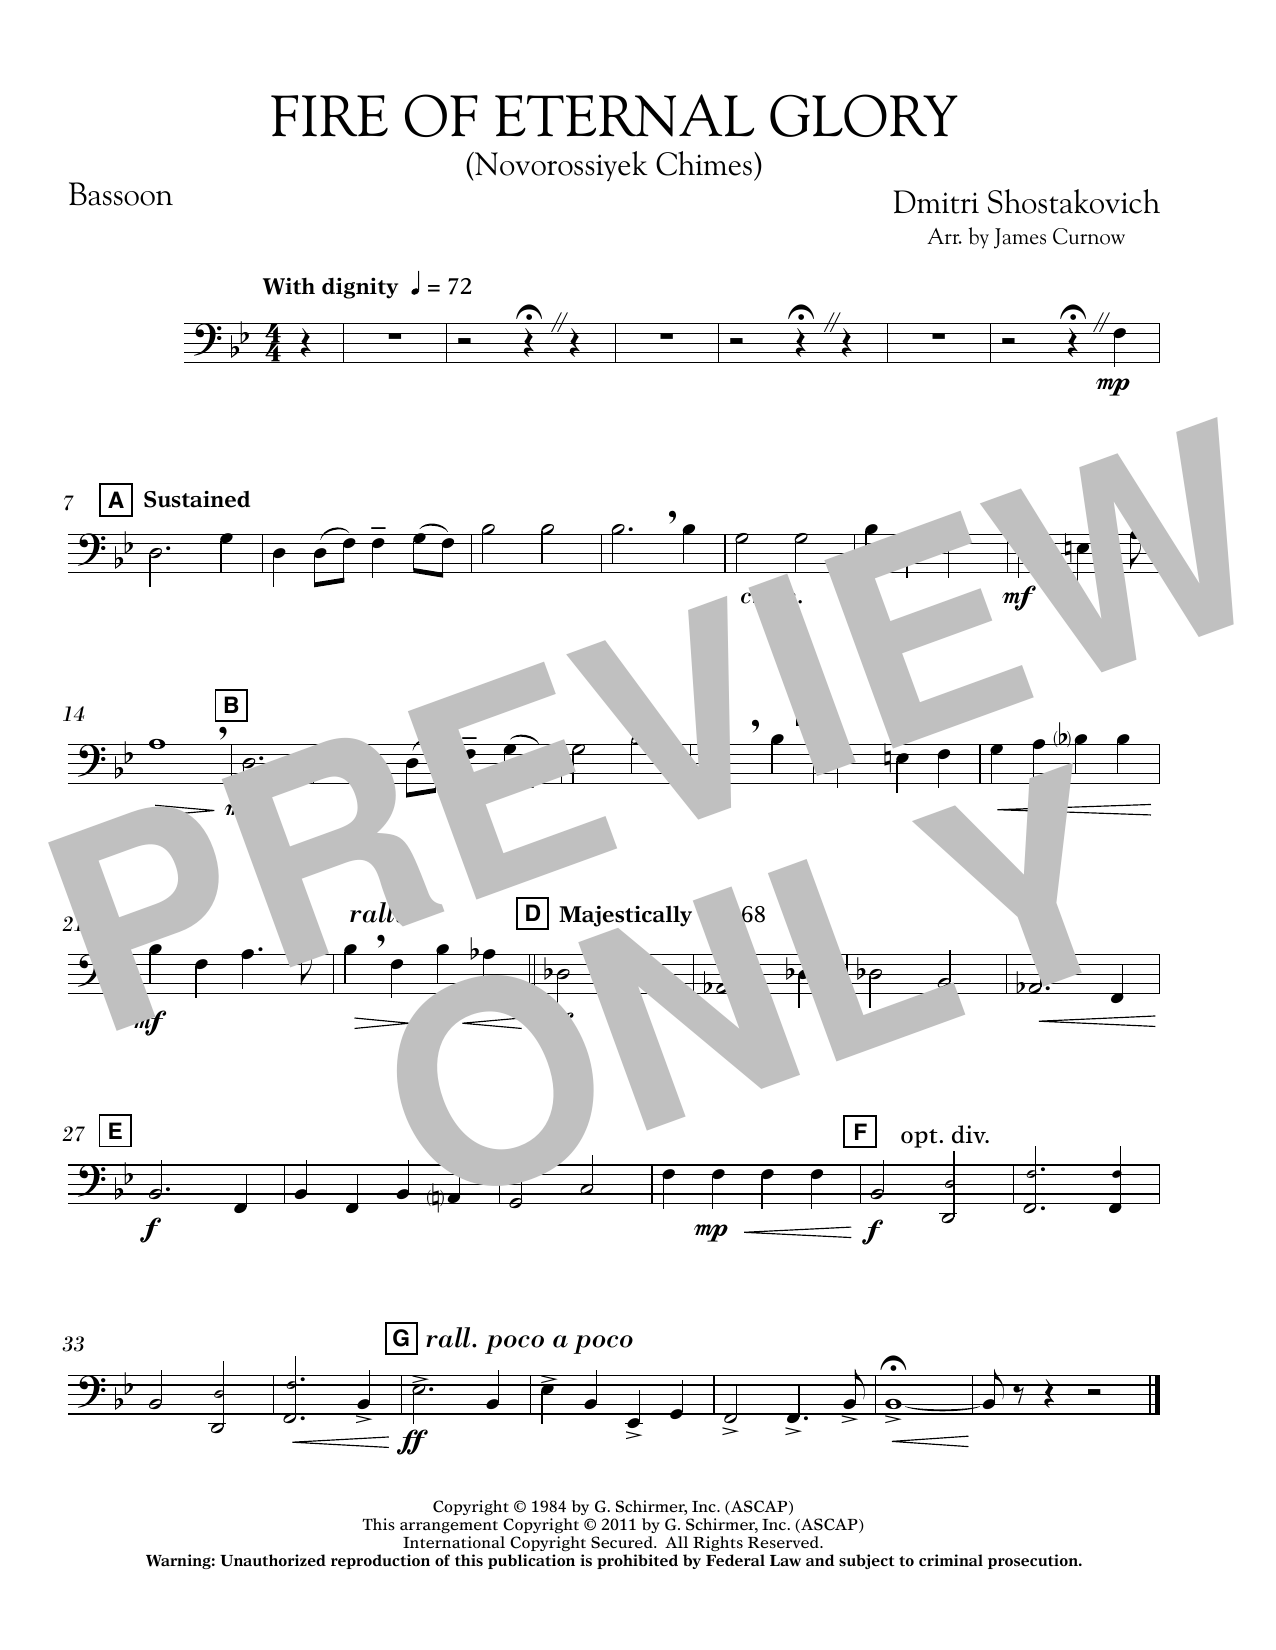 Fire of Eternal Glory (Novorossiyek Chimes) - Bassoon (Concert Band)